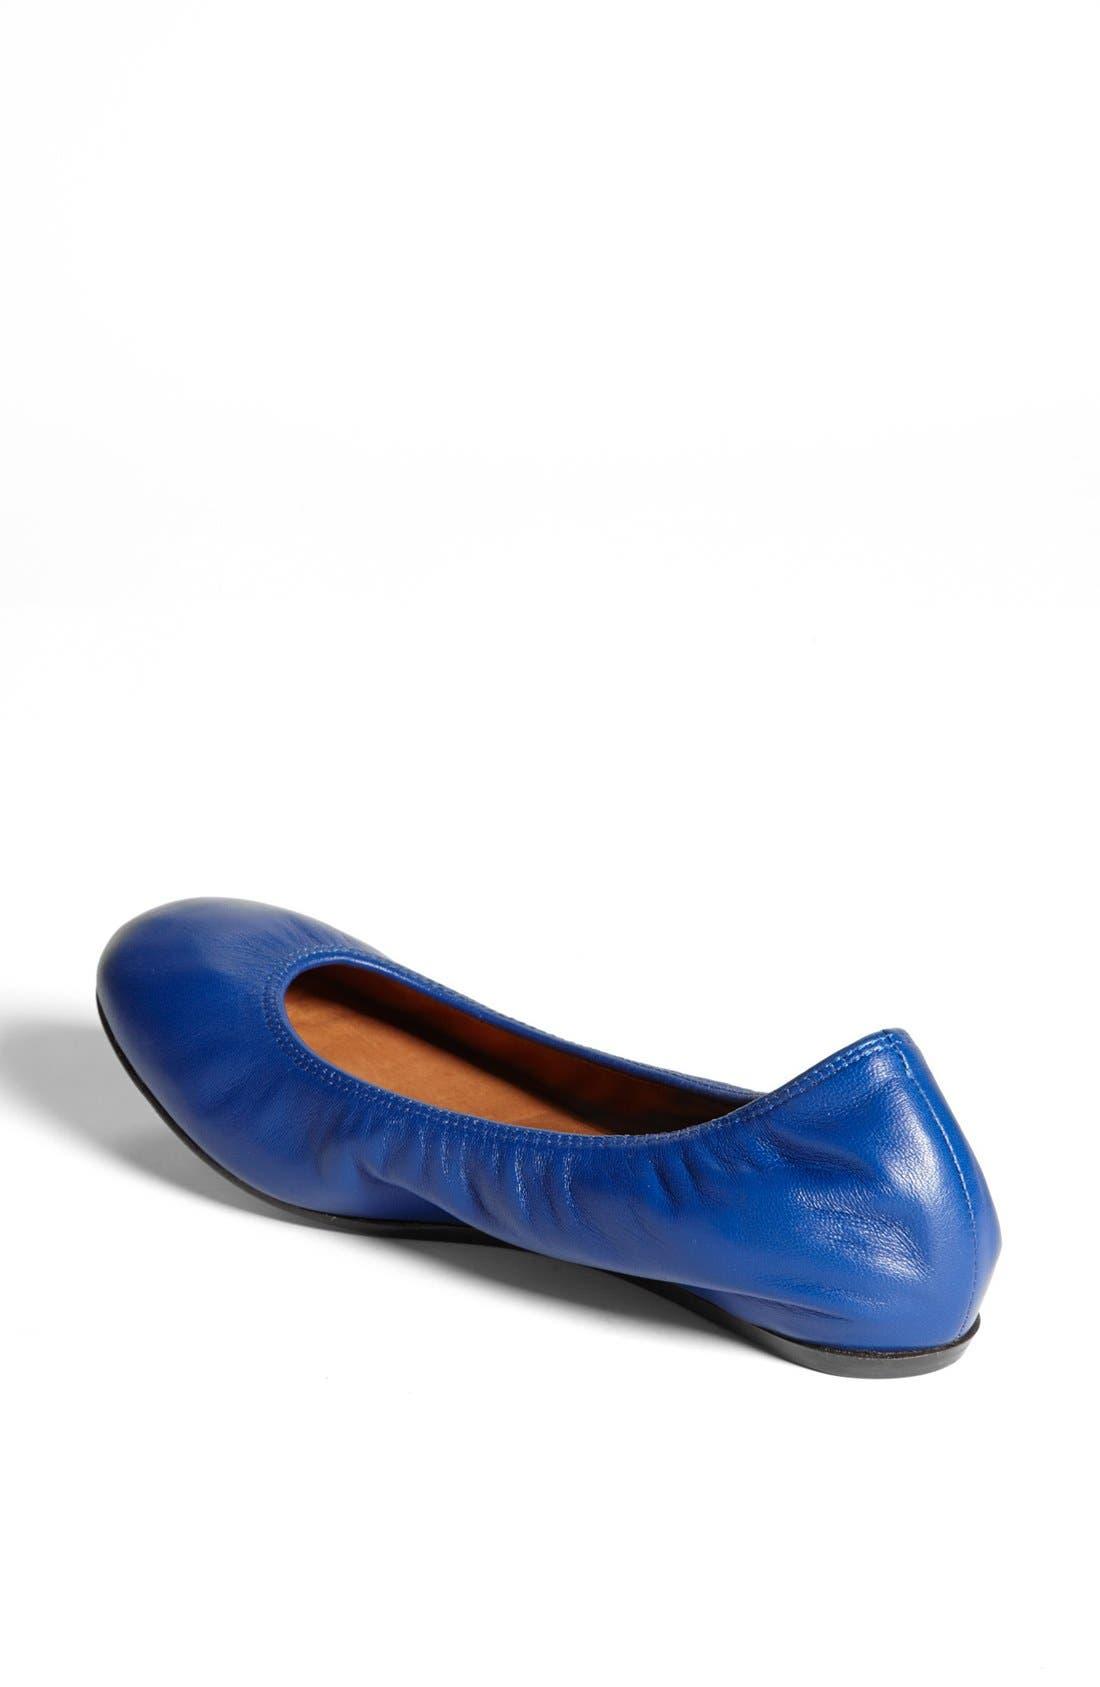 Alternate Image 2  - Lanvin Leather Ballerina Flat